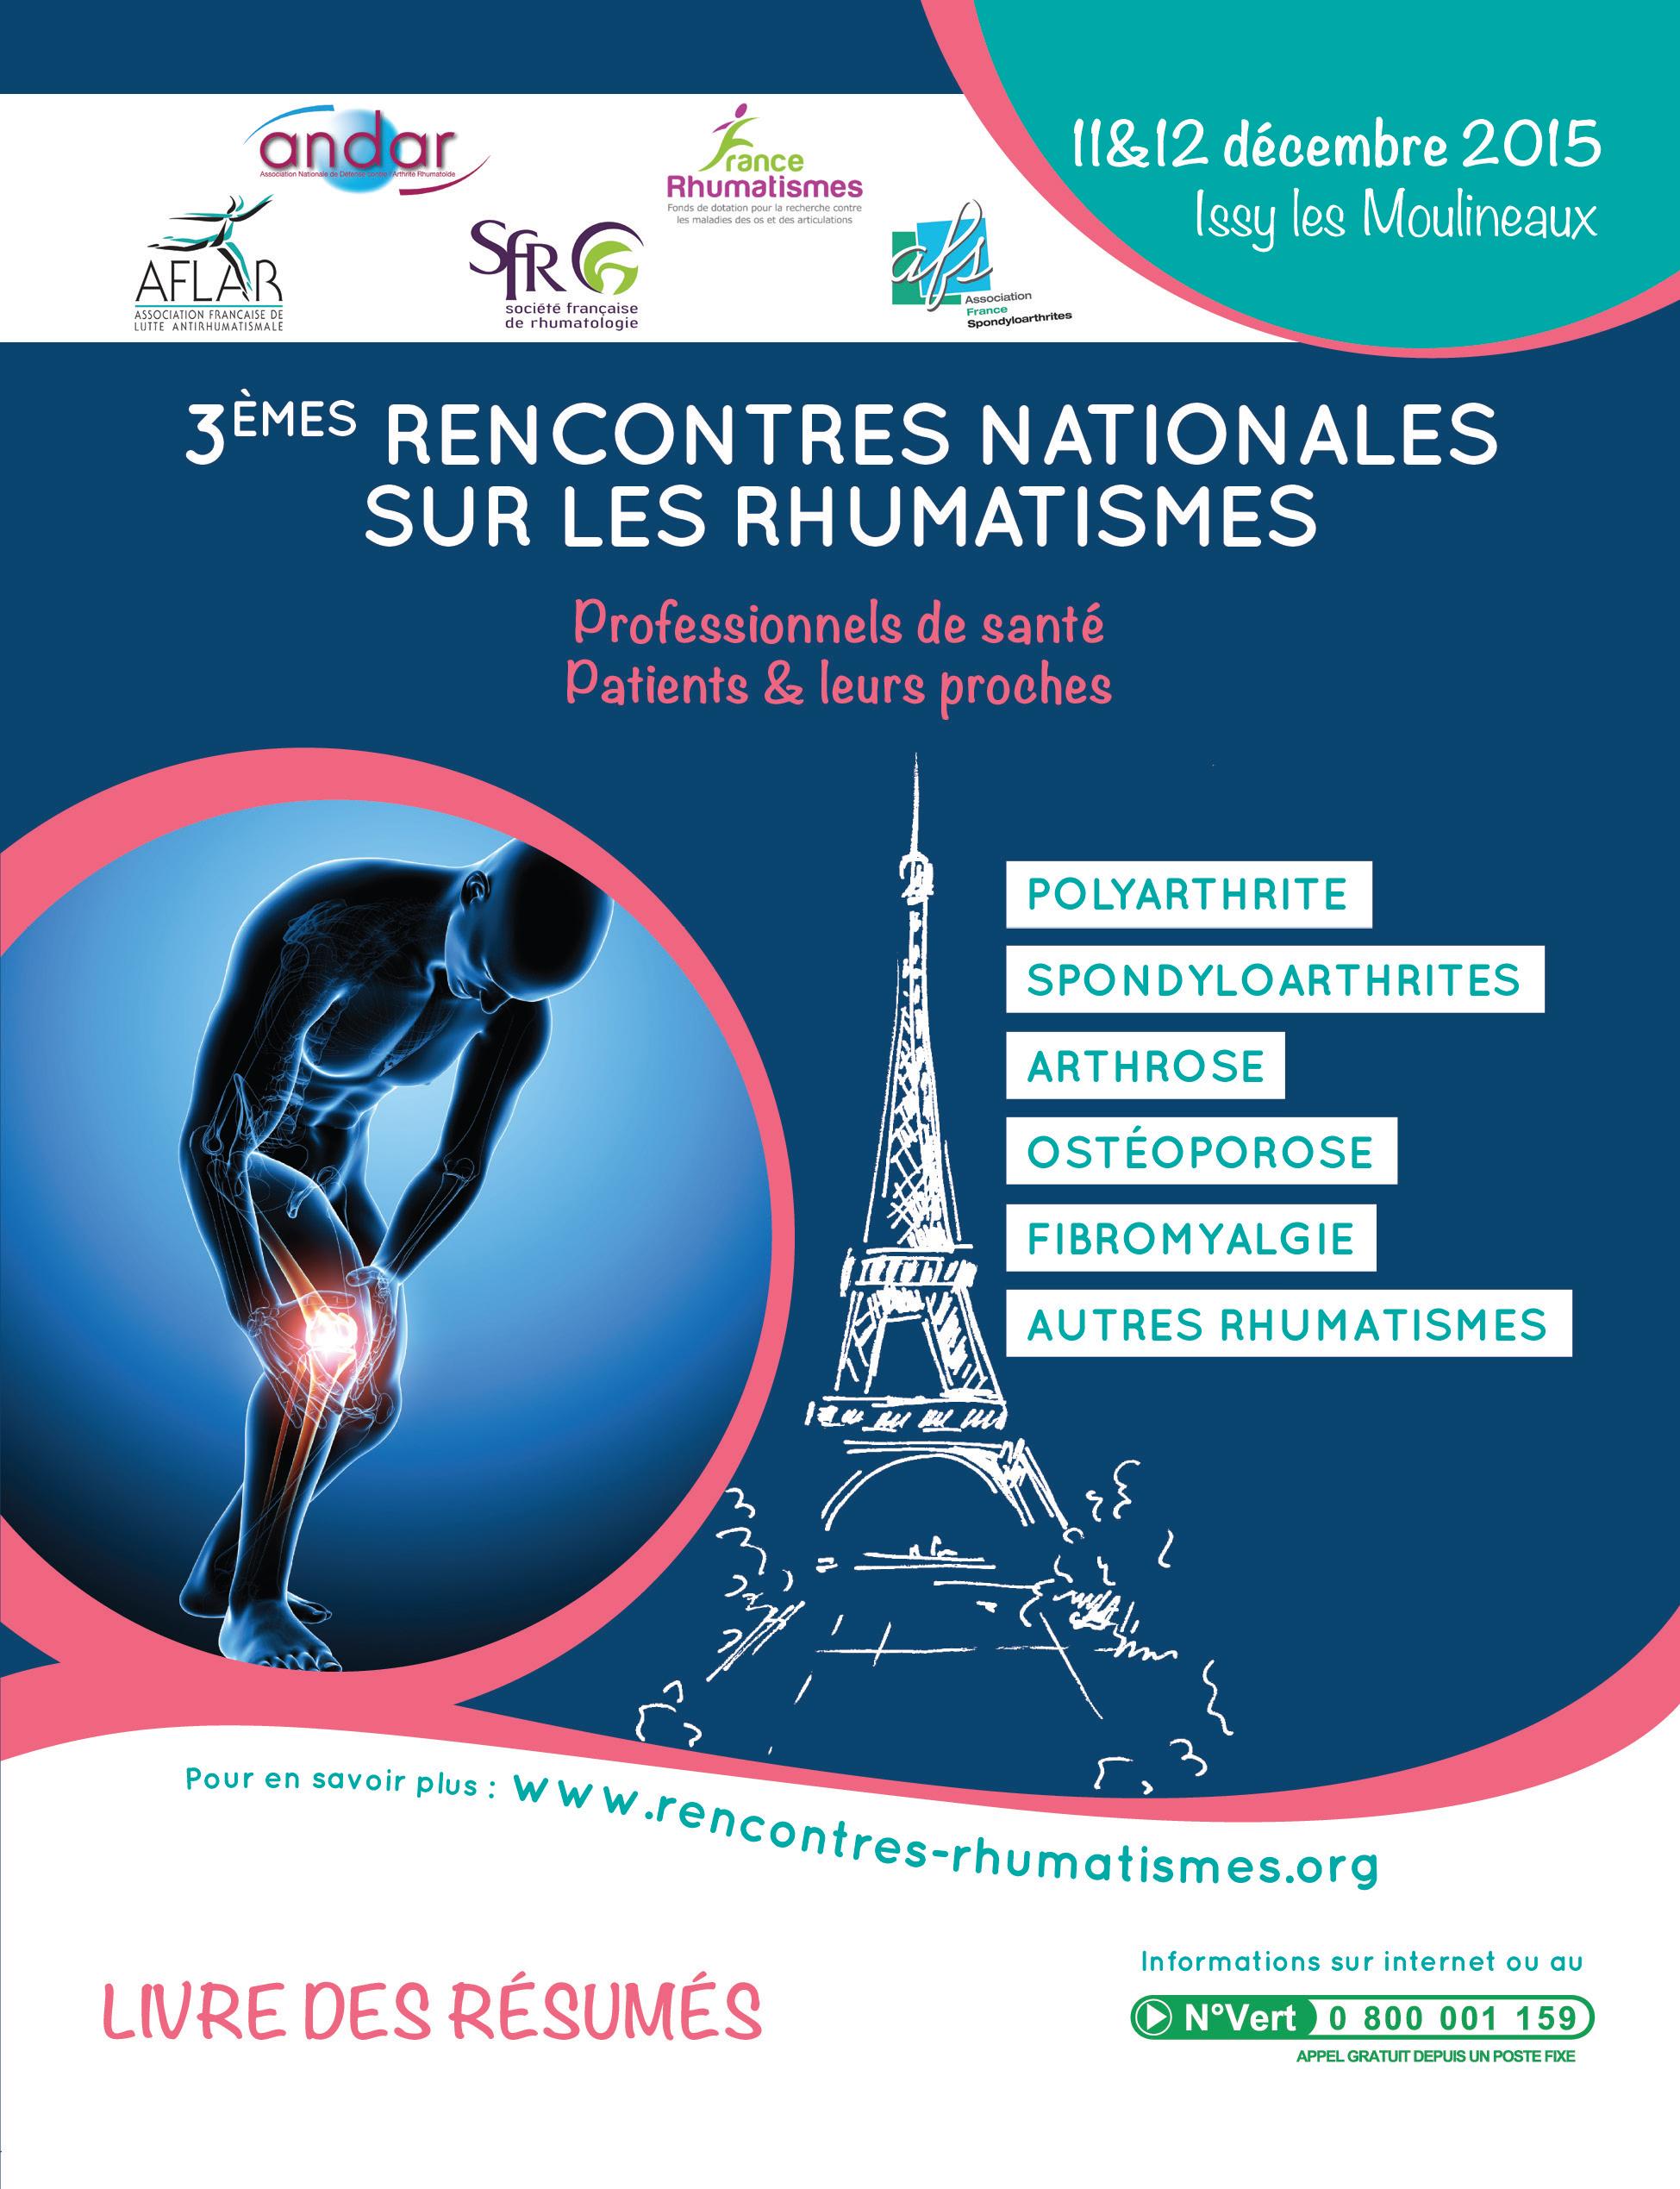 Revue du rhumatisme - Vol 77 - n° S2 - EM consulte